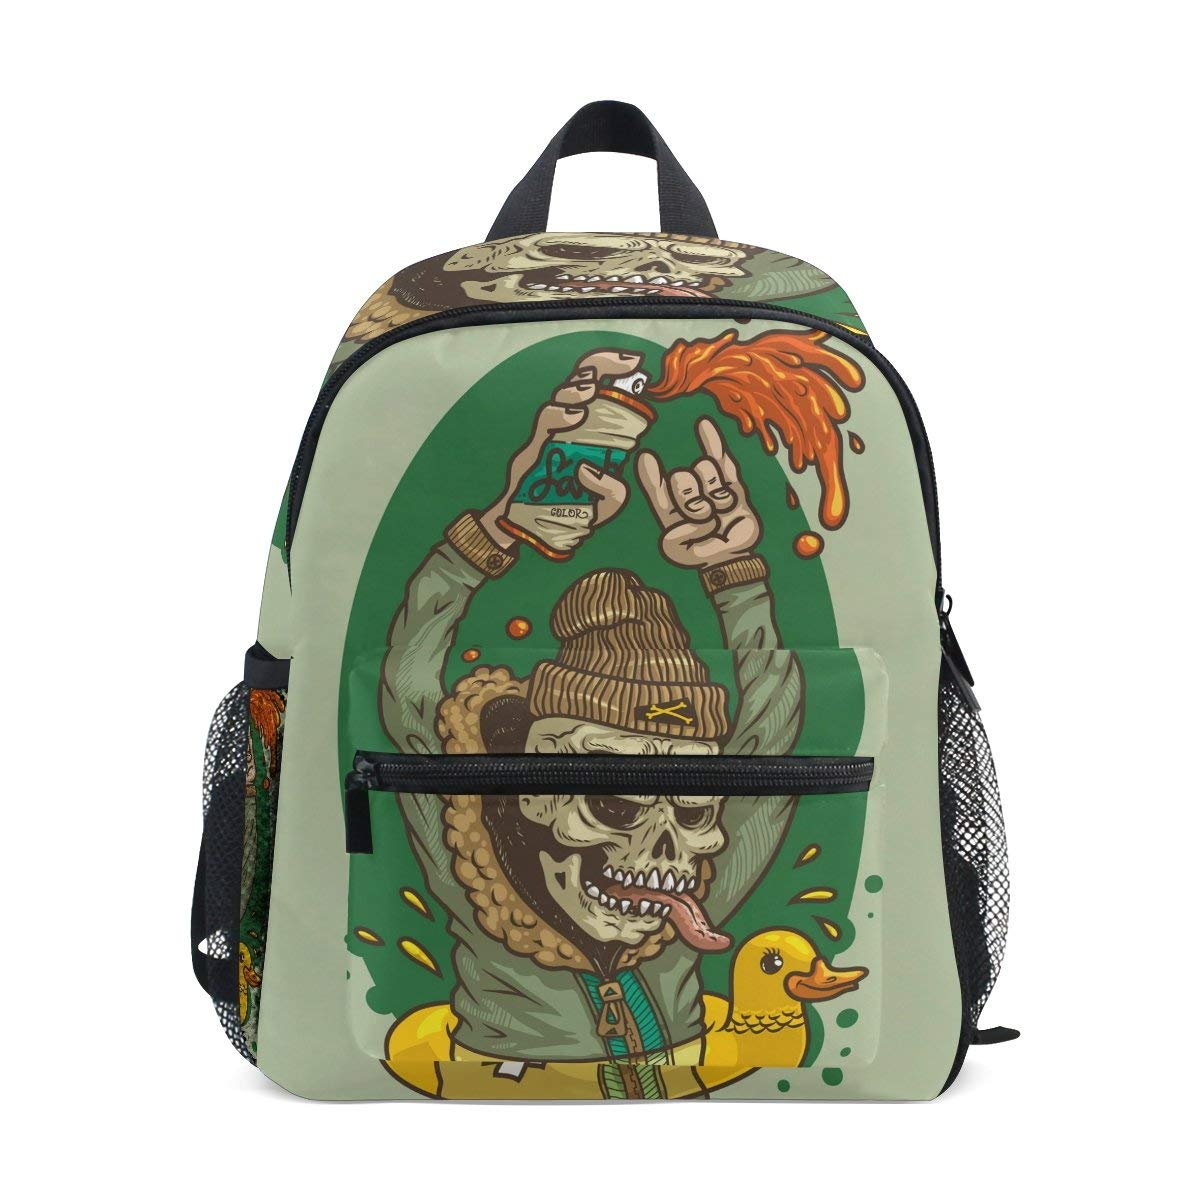 Colorful Skull School Backpack, Waterproof Bag Printing Design Daypack for Travel, School and Sports Shoulder Bag